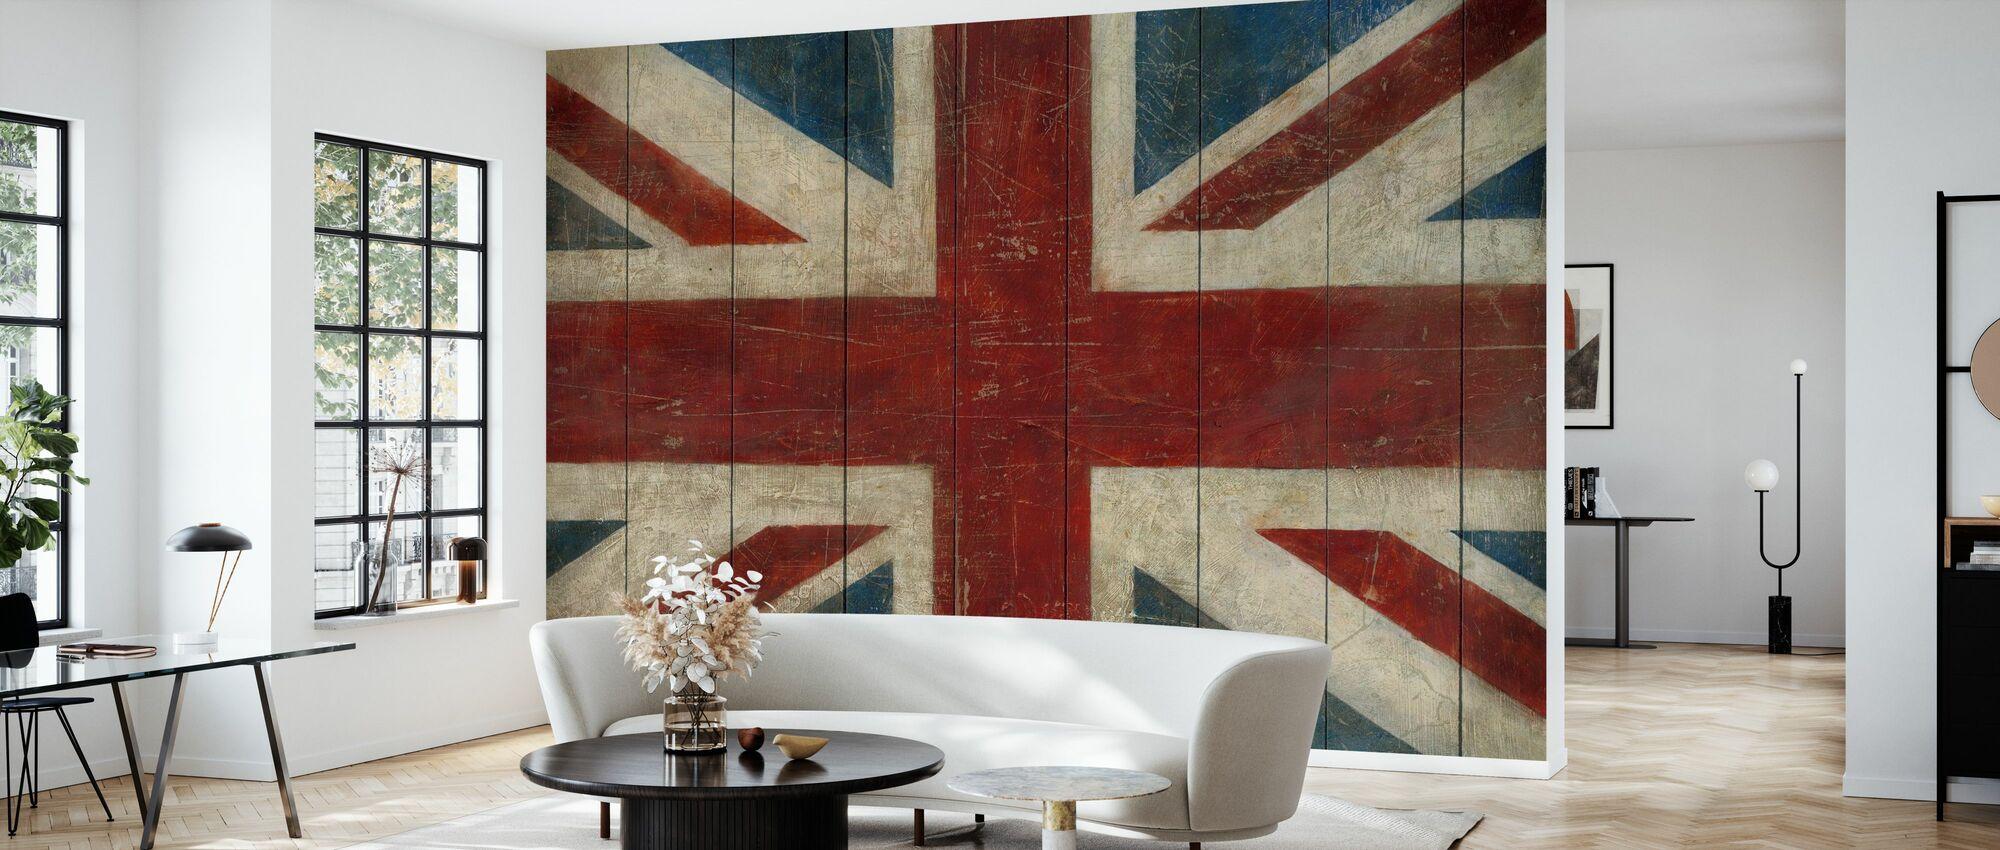 Avery Tillmon - Union Jack - Tapetti - Olohuone